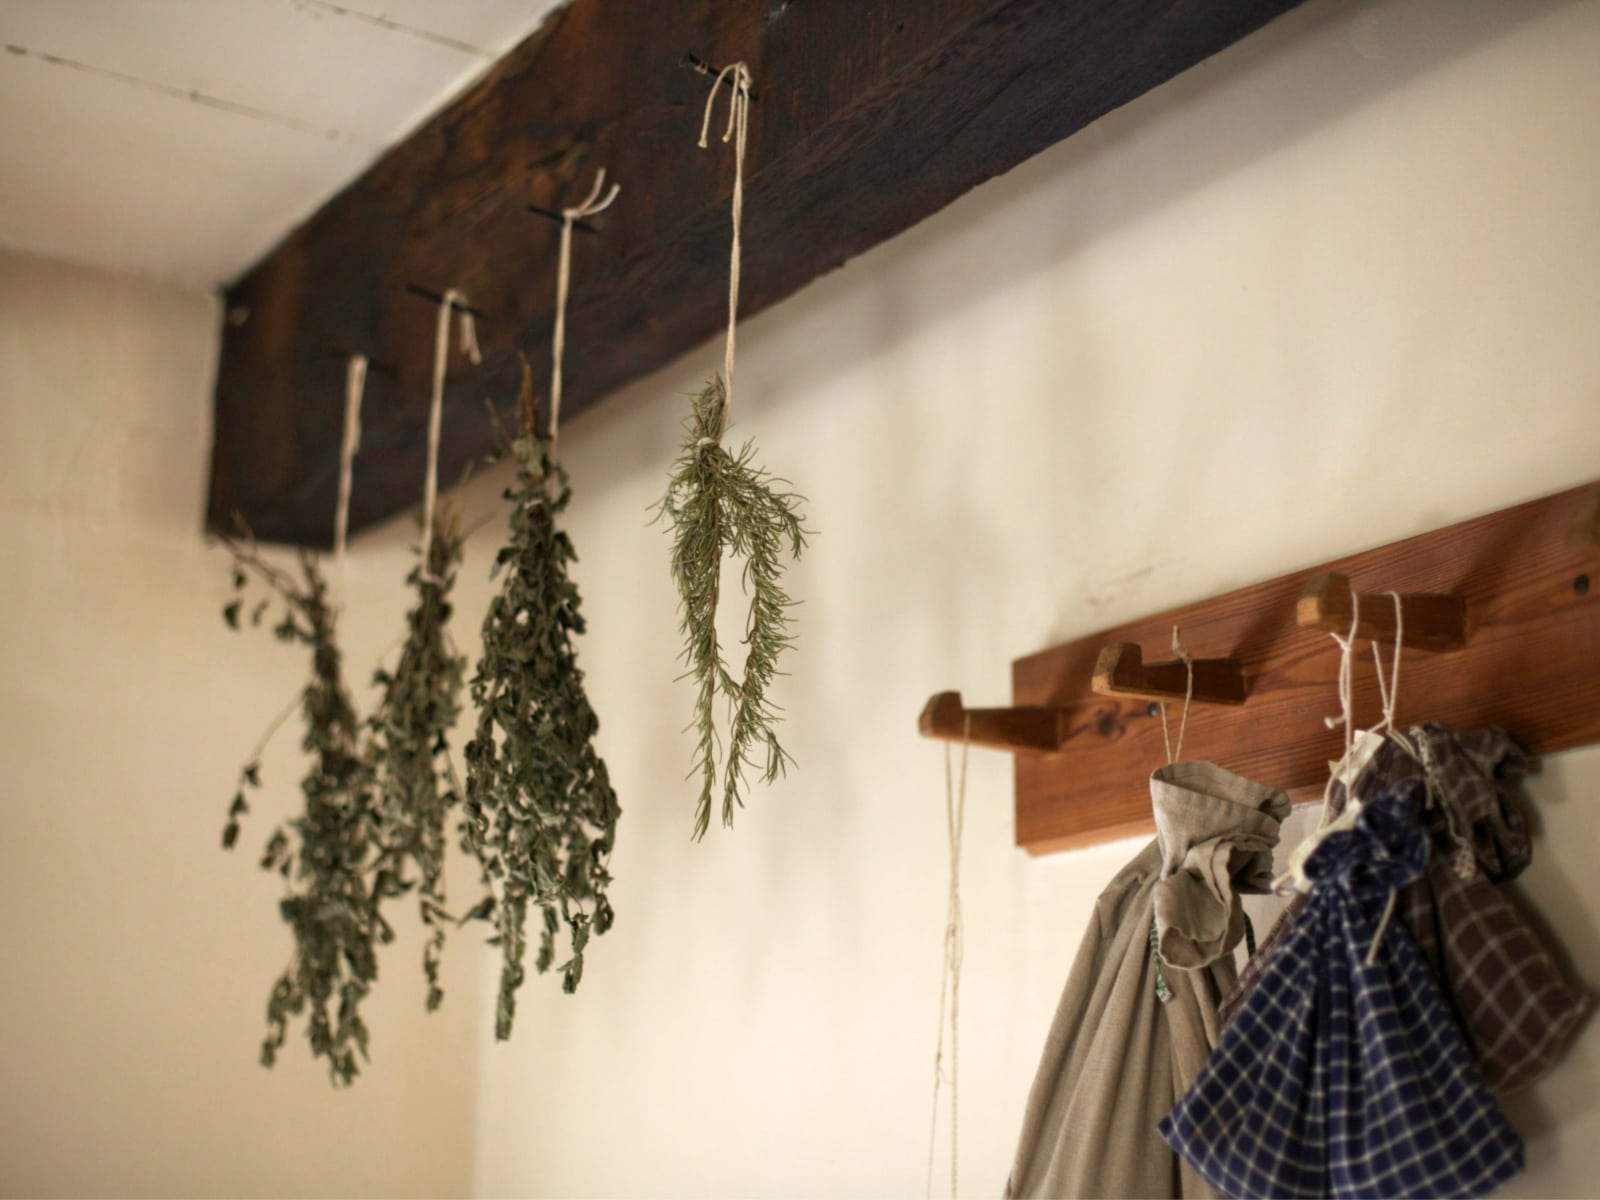 herb bundles hanging from kitchen rafter